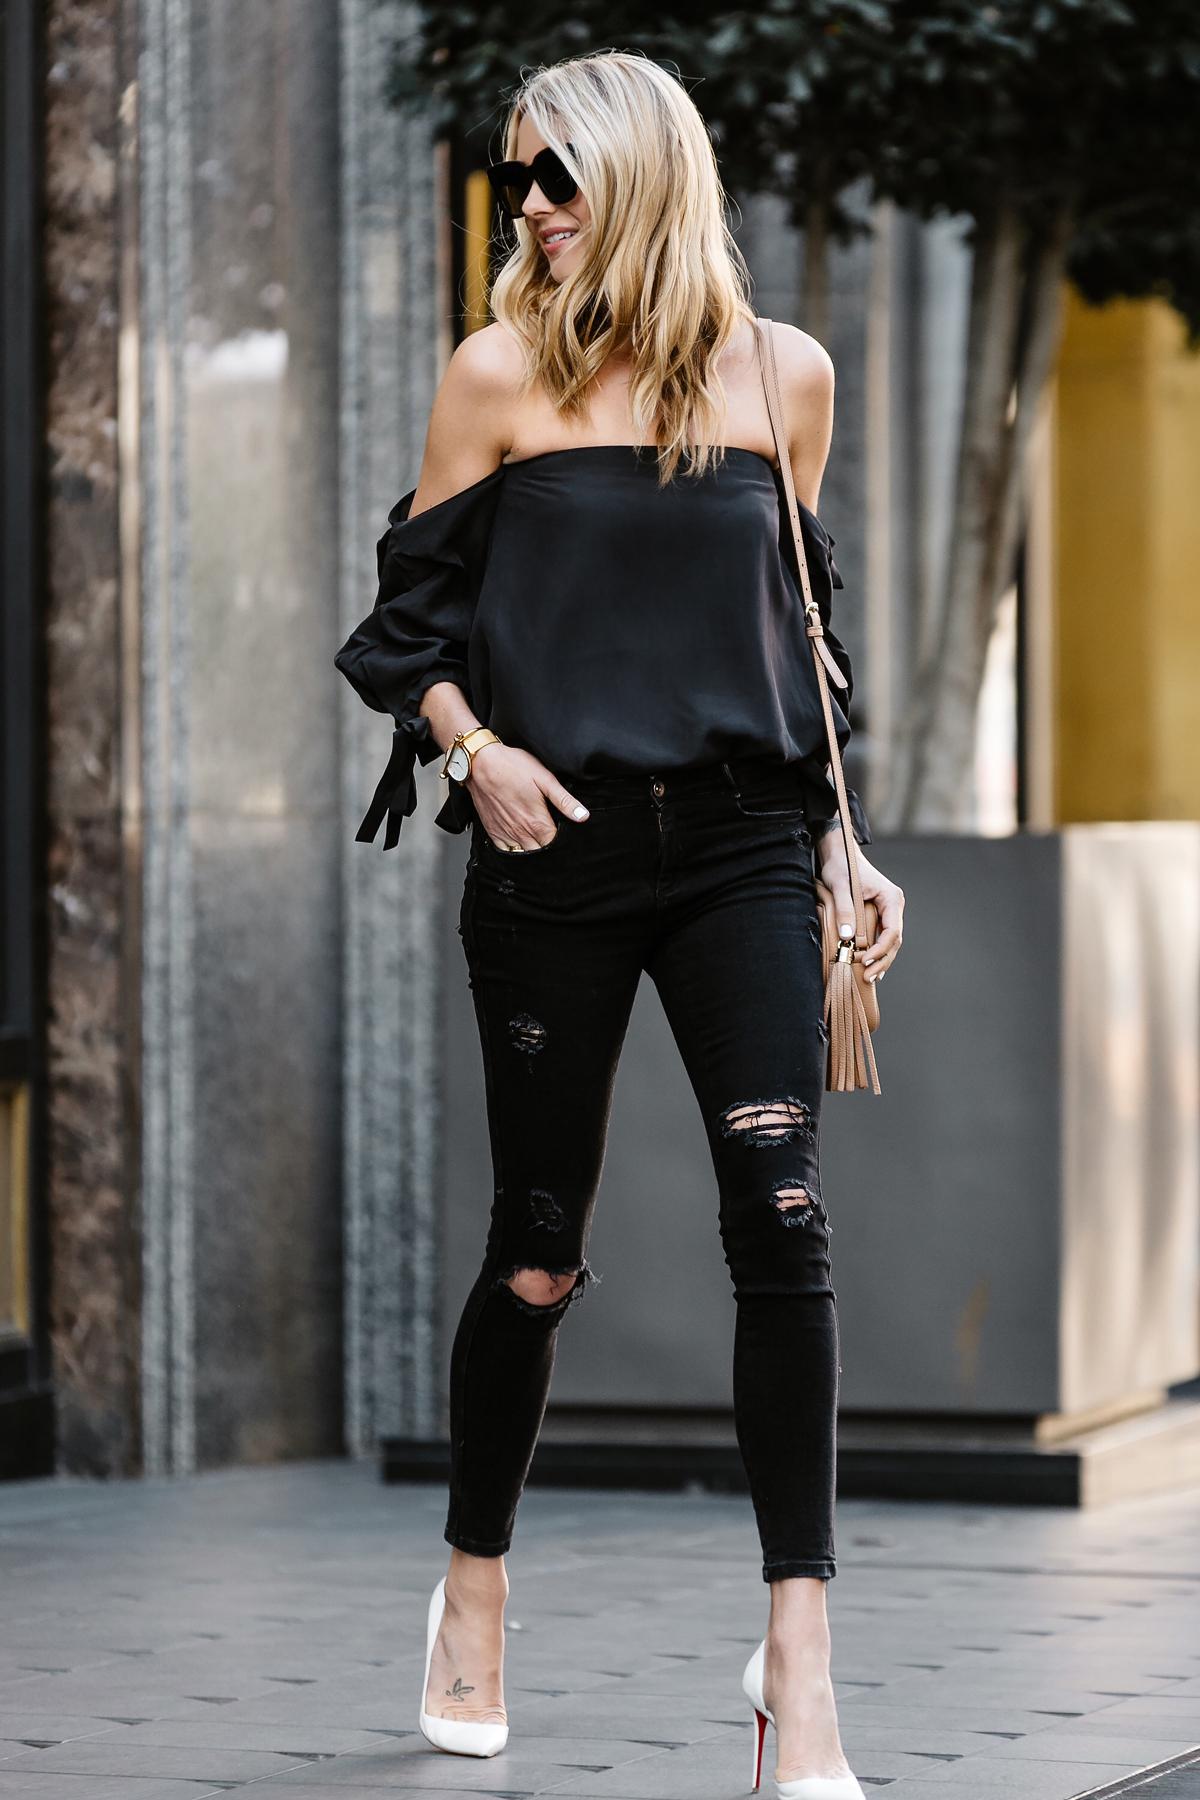 Fashion Jackson, Dallas Blogger, Fashion Blogger, Street Style, Club Monaco Liki Silk Top, Black Off-the-Shoulder Top, Black Ripped Skinny Jeans, Christian Louboutin White Pumps, Gucci Soho Disco Crossbody